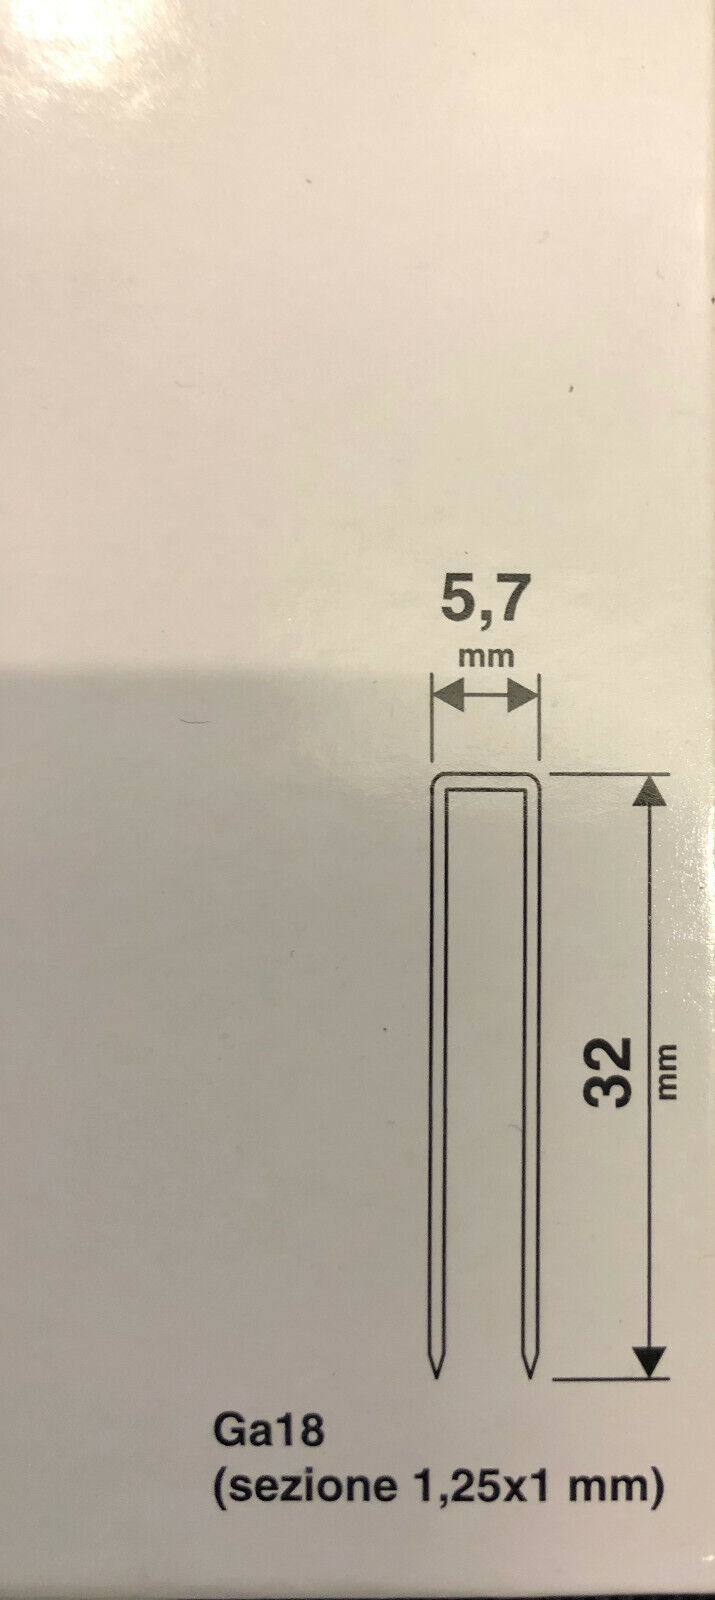 VALEX 1000PZ PUNTI PUNTATRICE 5,7x19MM SPARAPUNTI GA18 1,25x1MM PINZATRICE